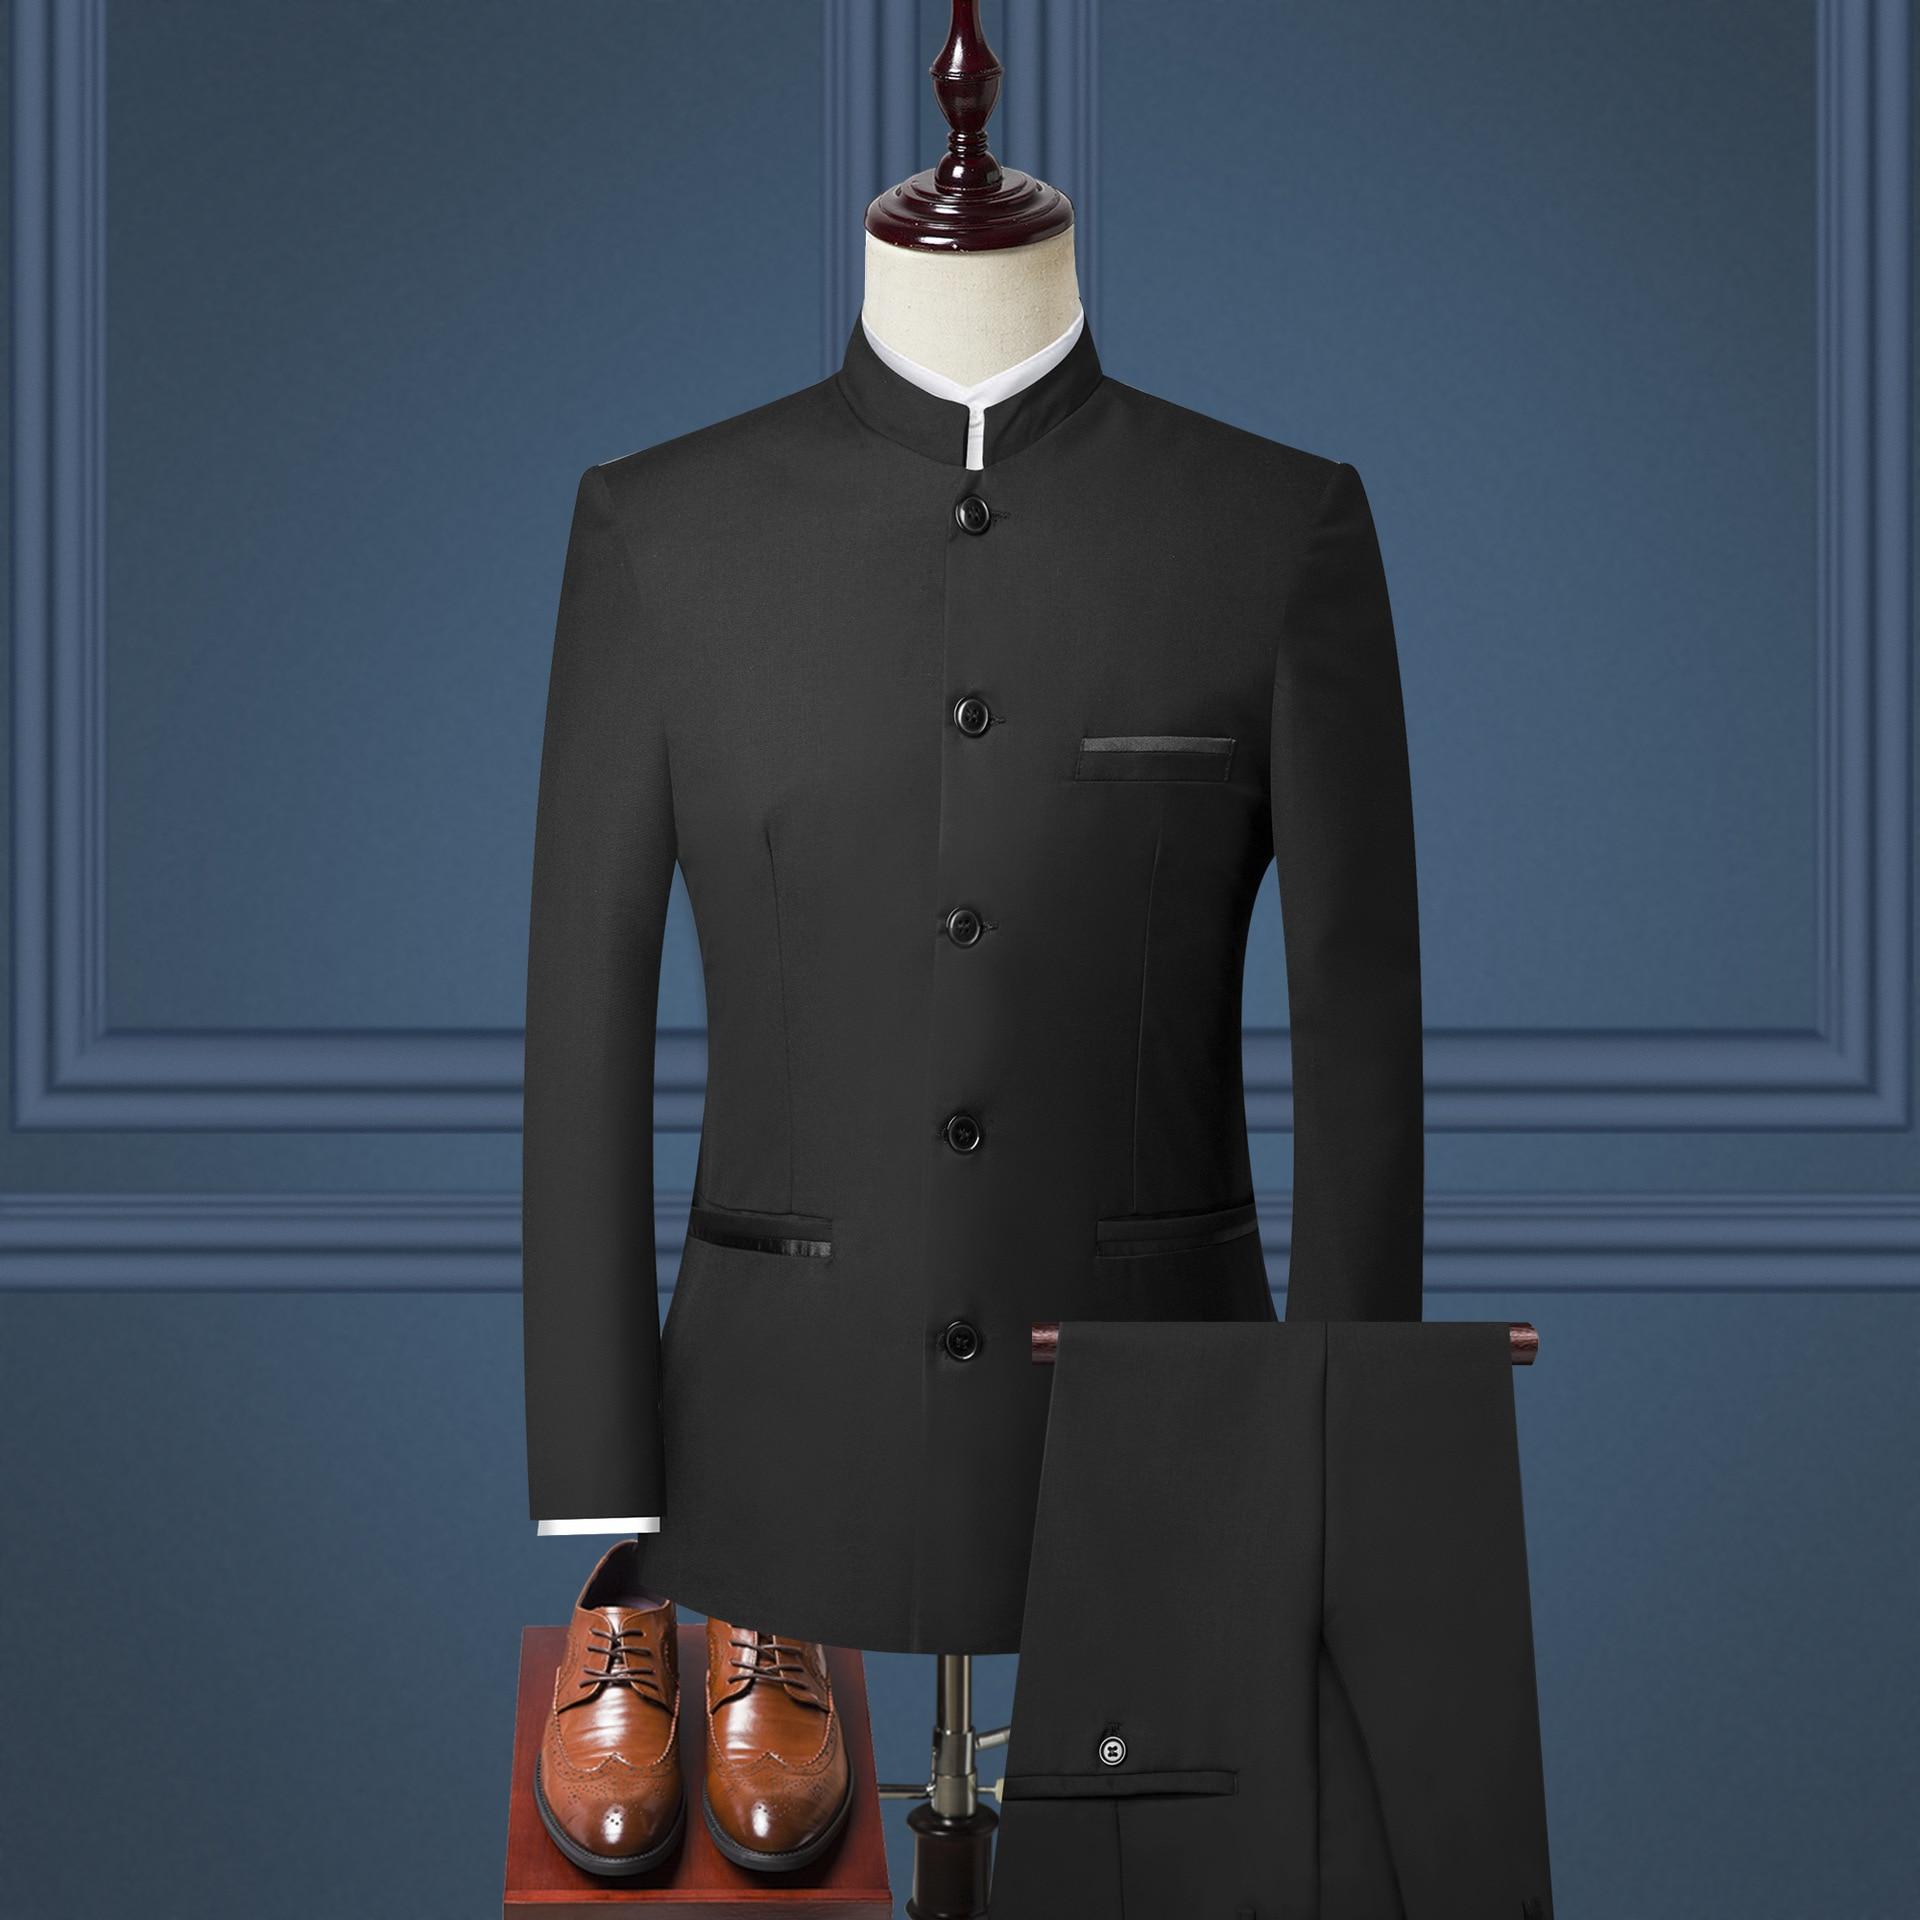 Men's Korean-style Slim Fit Sun Yat-sen Costume Formal Dress Suit Chinese Costume Set Three-piece Set Men's